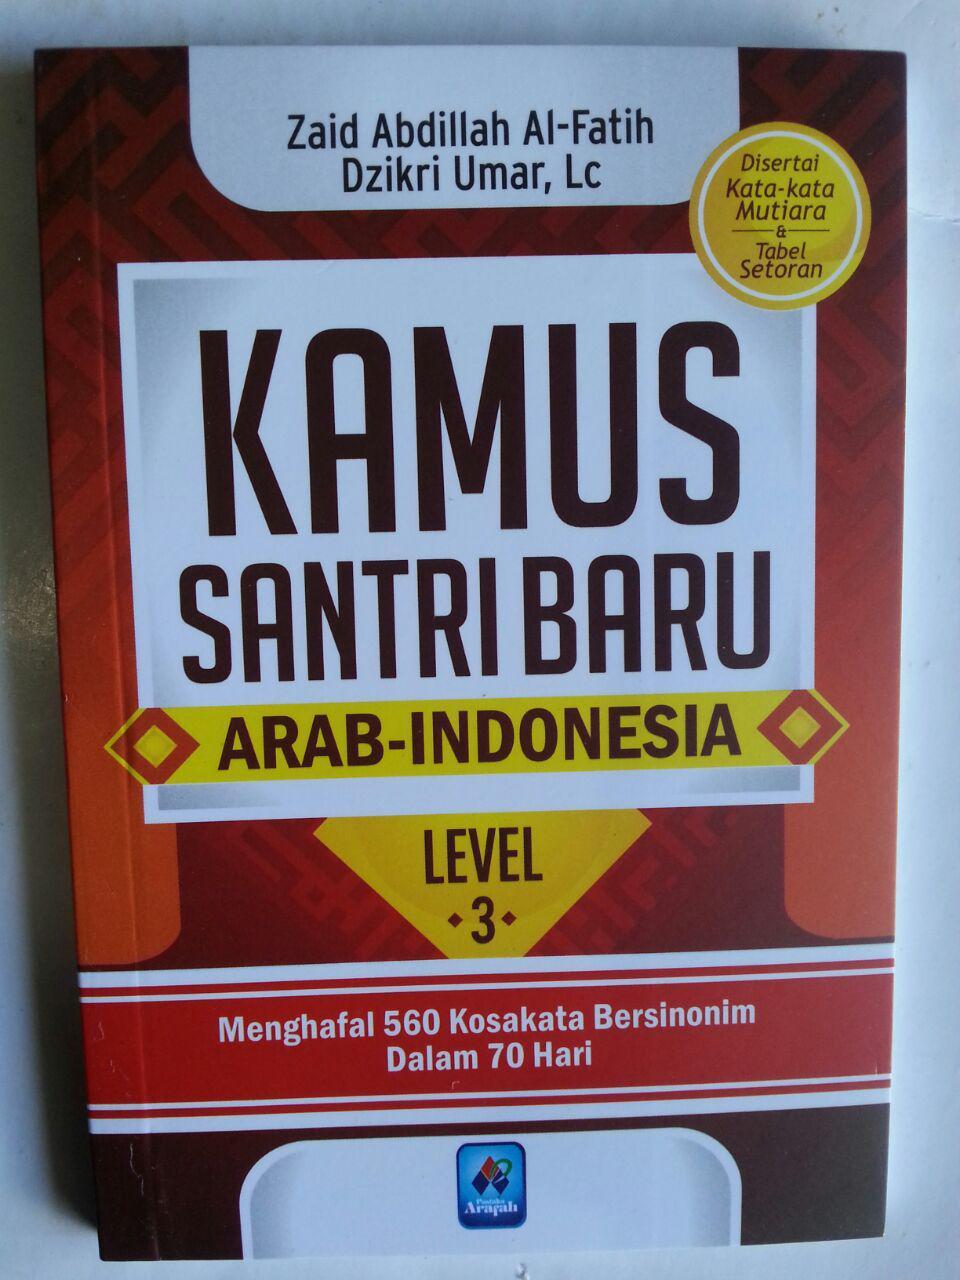 Buku Kamus Santri Baru Arab Indonesia 1 Set 3 Jilid cover 2